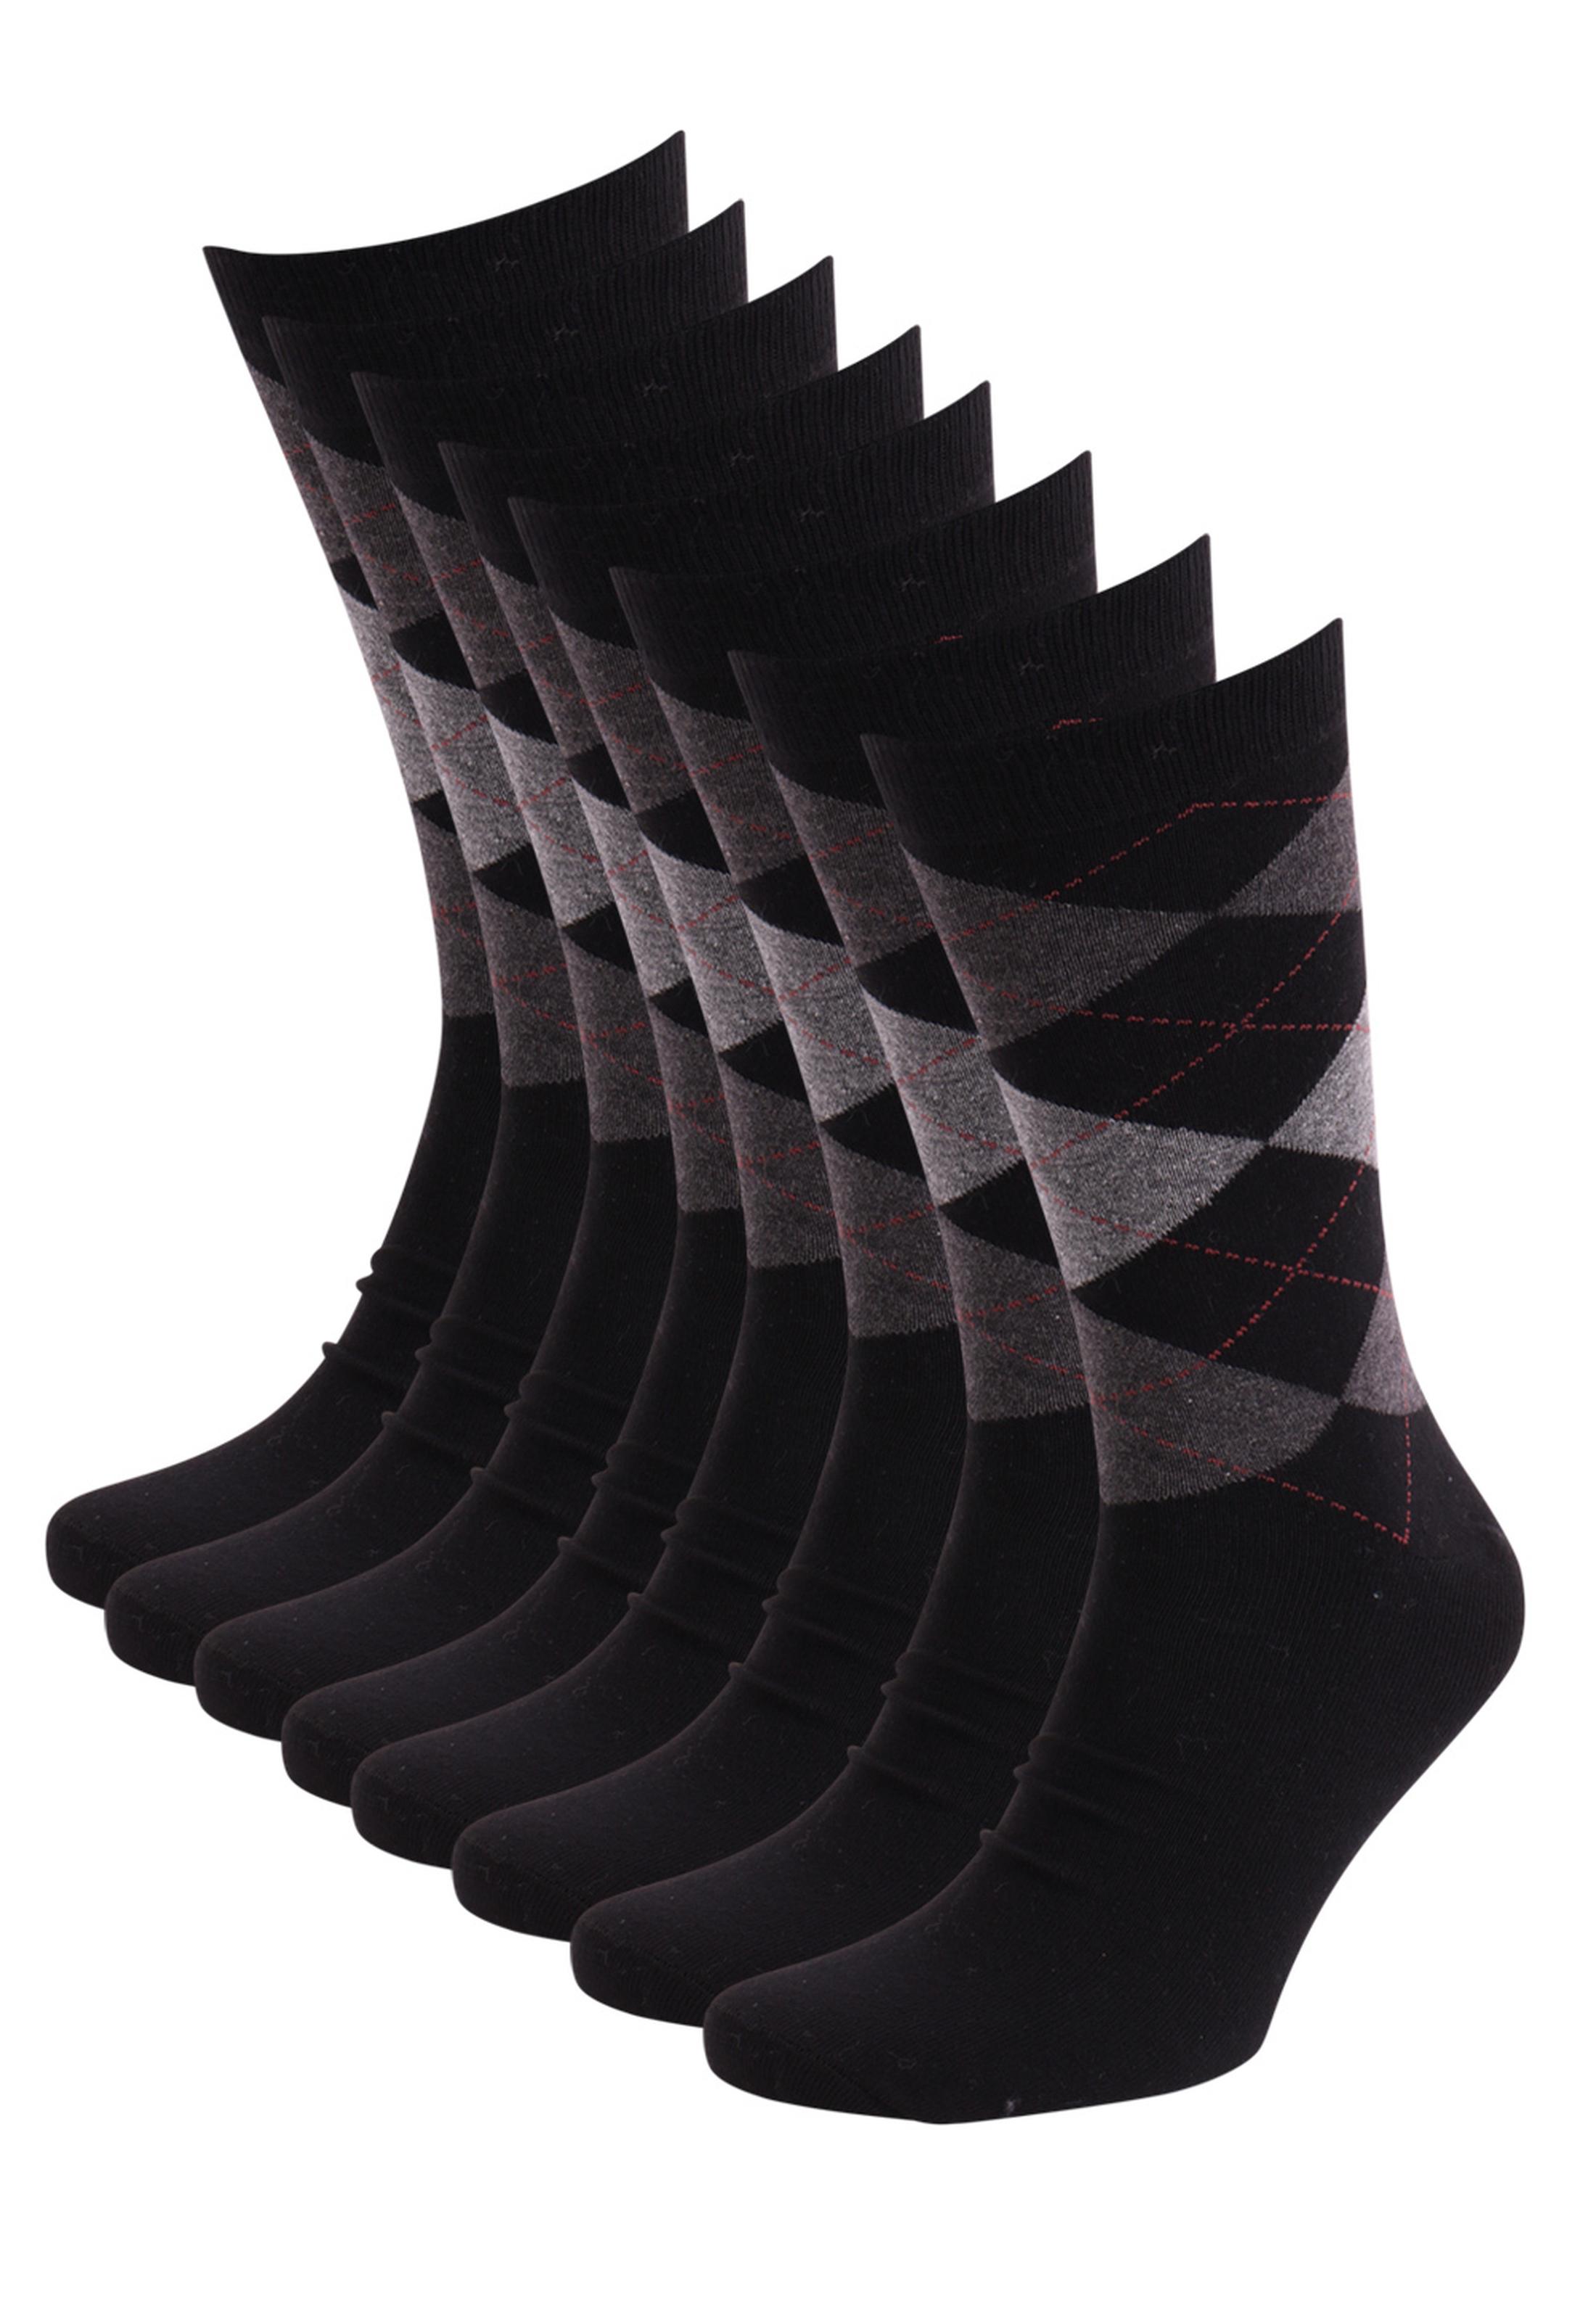 Suitable Socken Kariert Schwarz 8-Pack foto 0